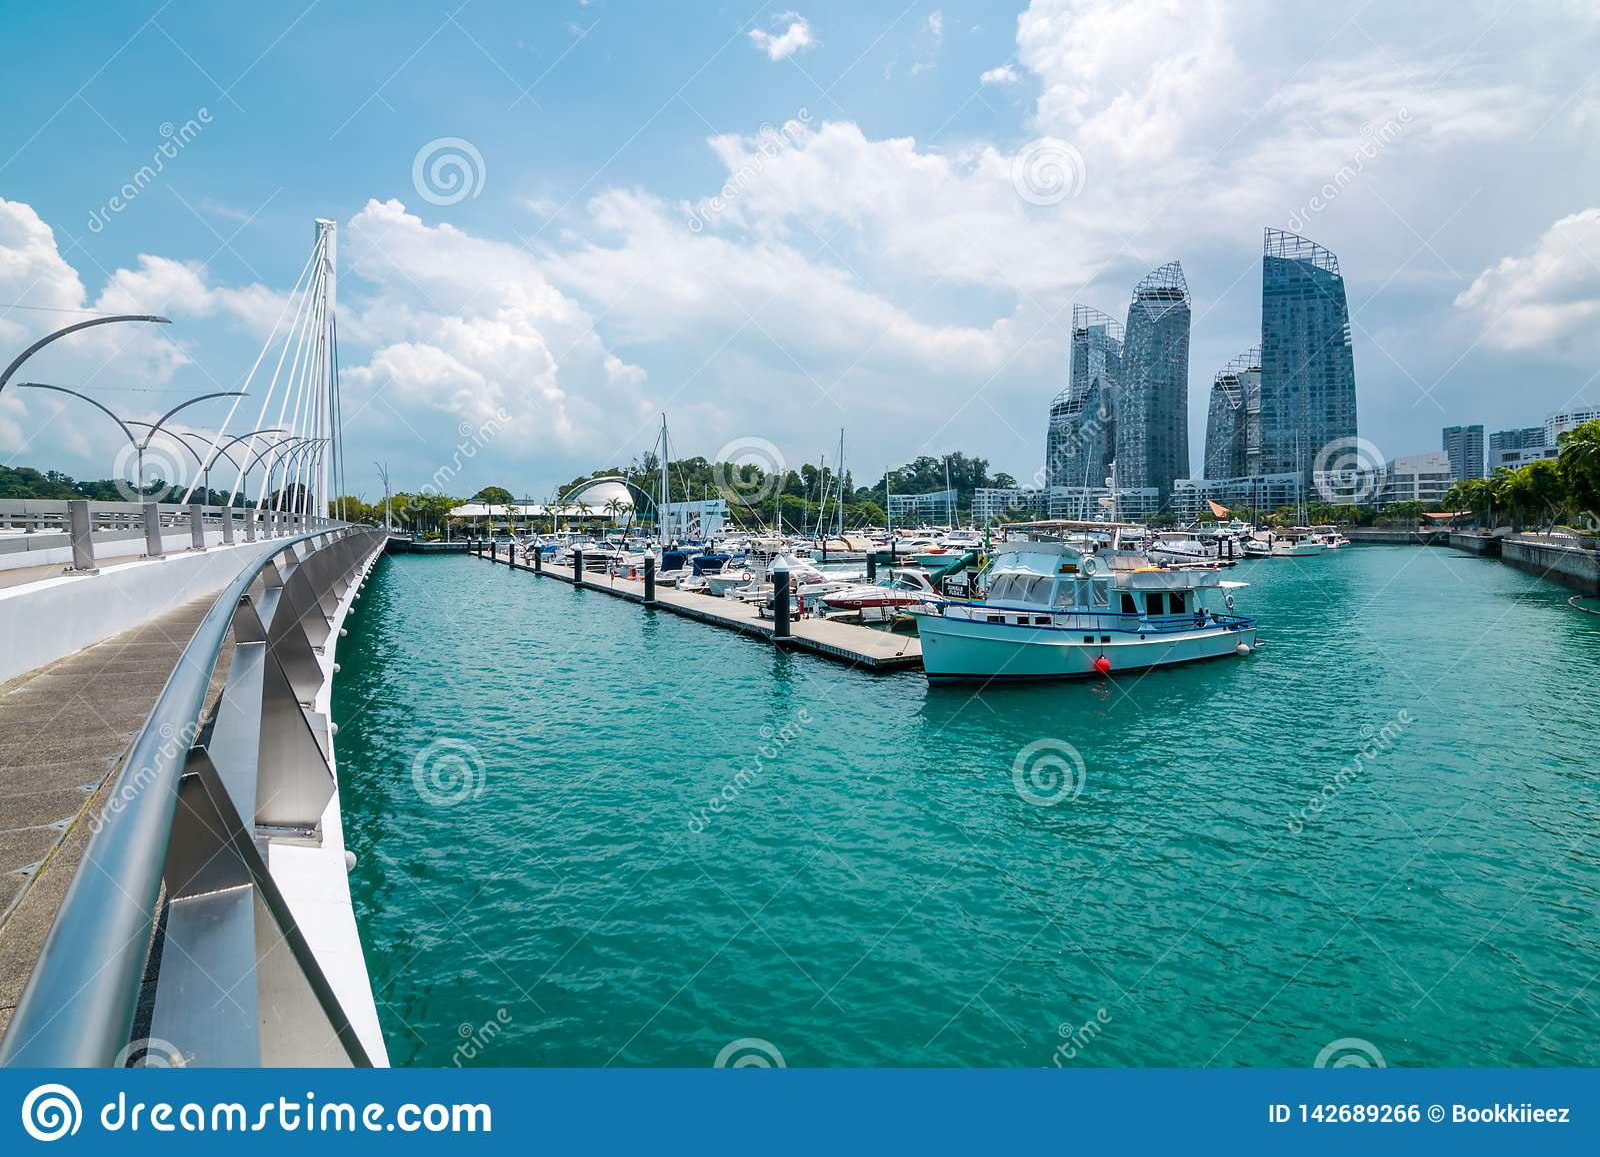 Cityscape met botenmening van Keppel-eiland in Singapore